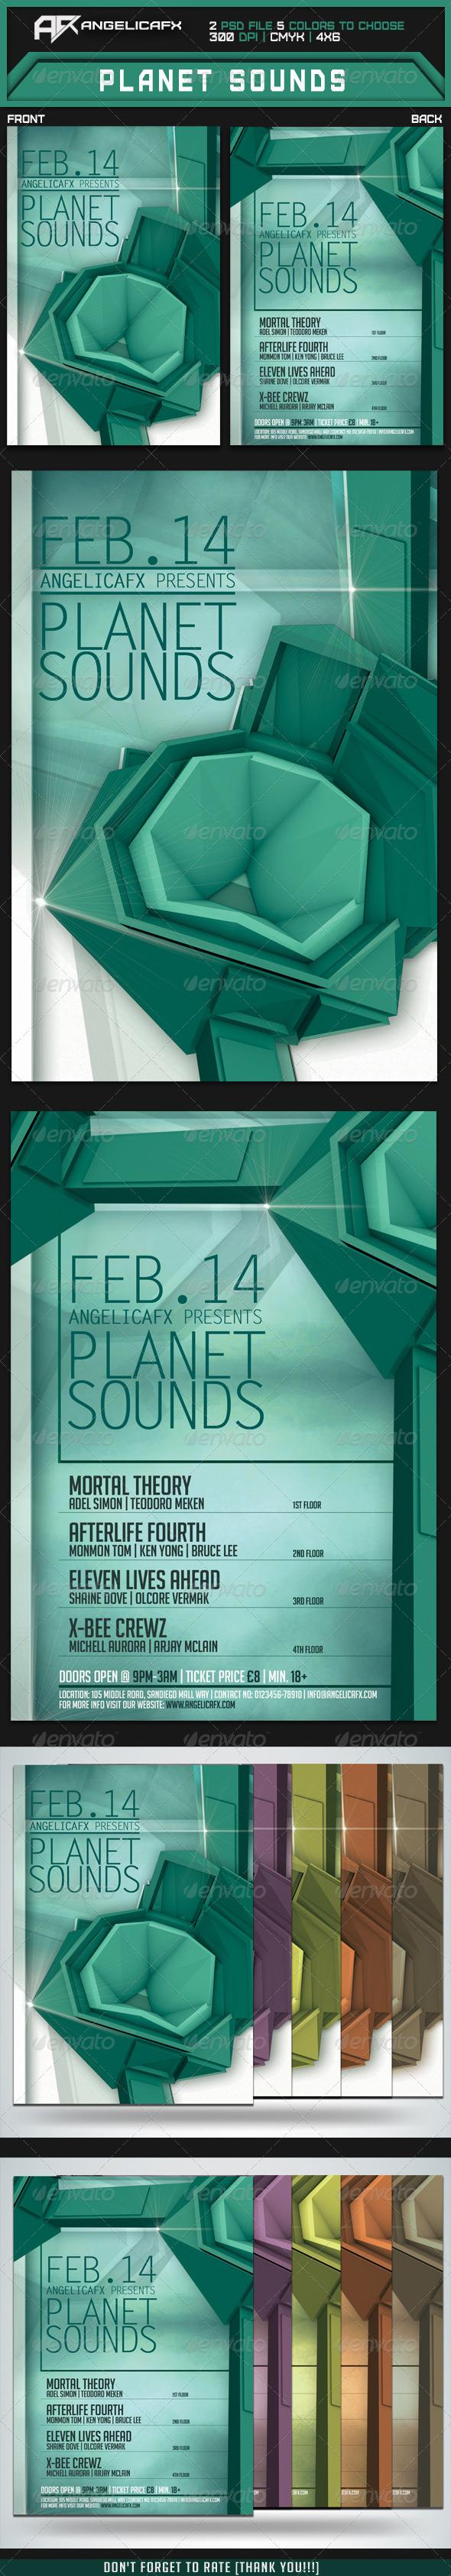 Planet Sounds Flyer Template - Flyers Print Templates